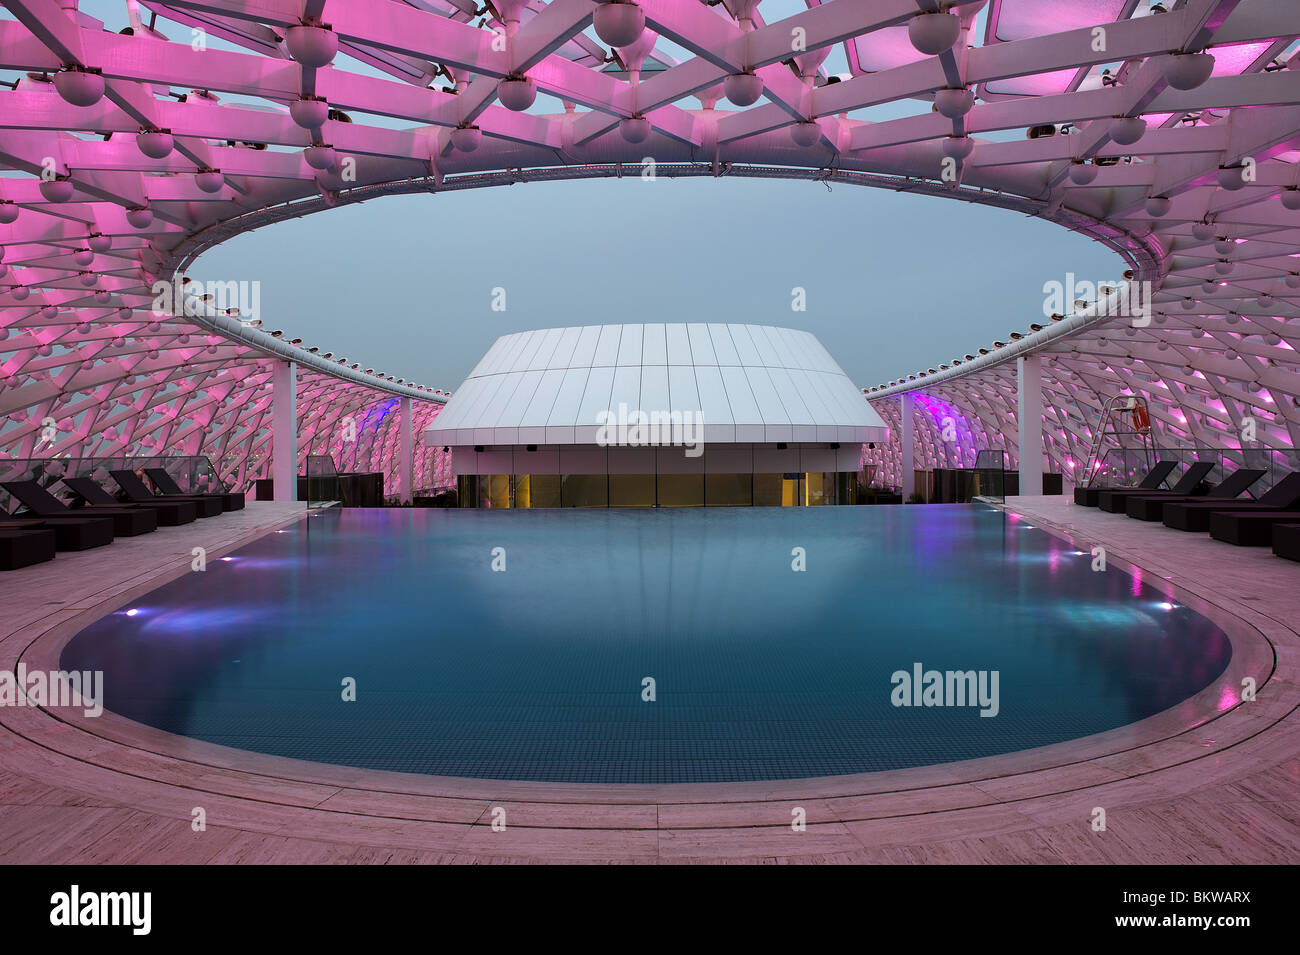 Swimming Pool At Yas Marina Hotel Abu Dhabi Stock Photo Royalty Free Image 29446142 Alamy